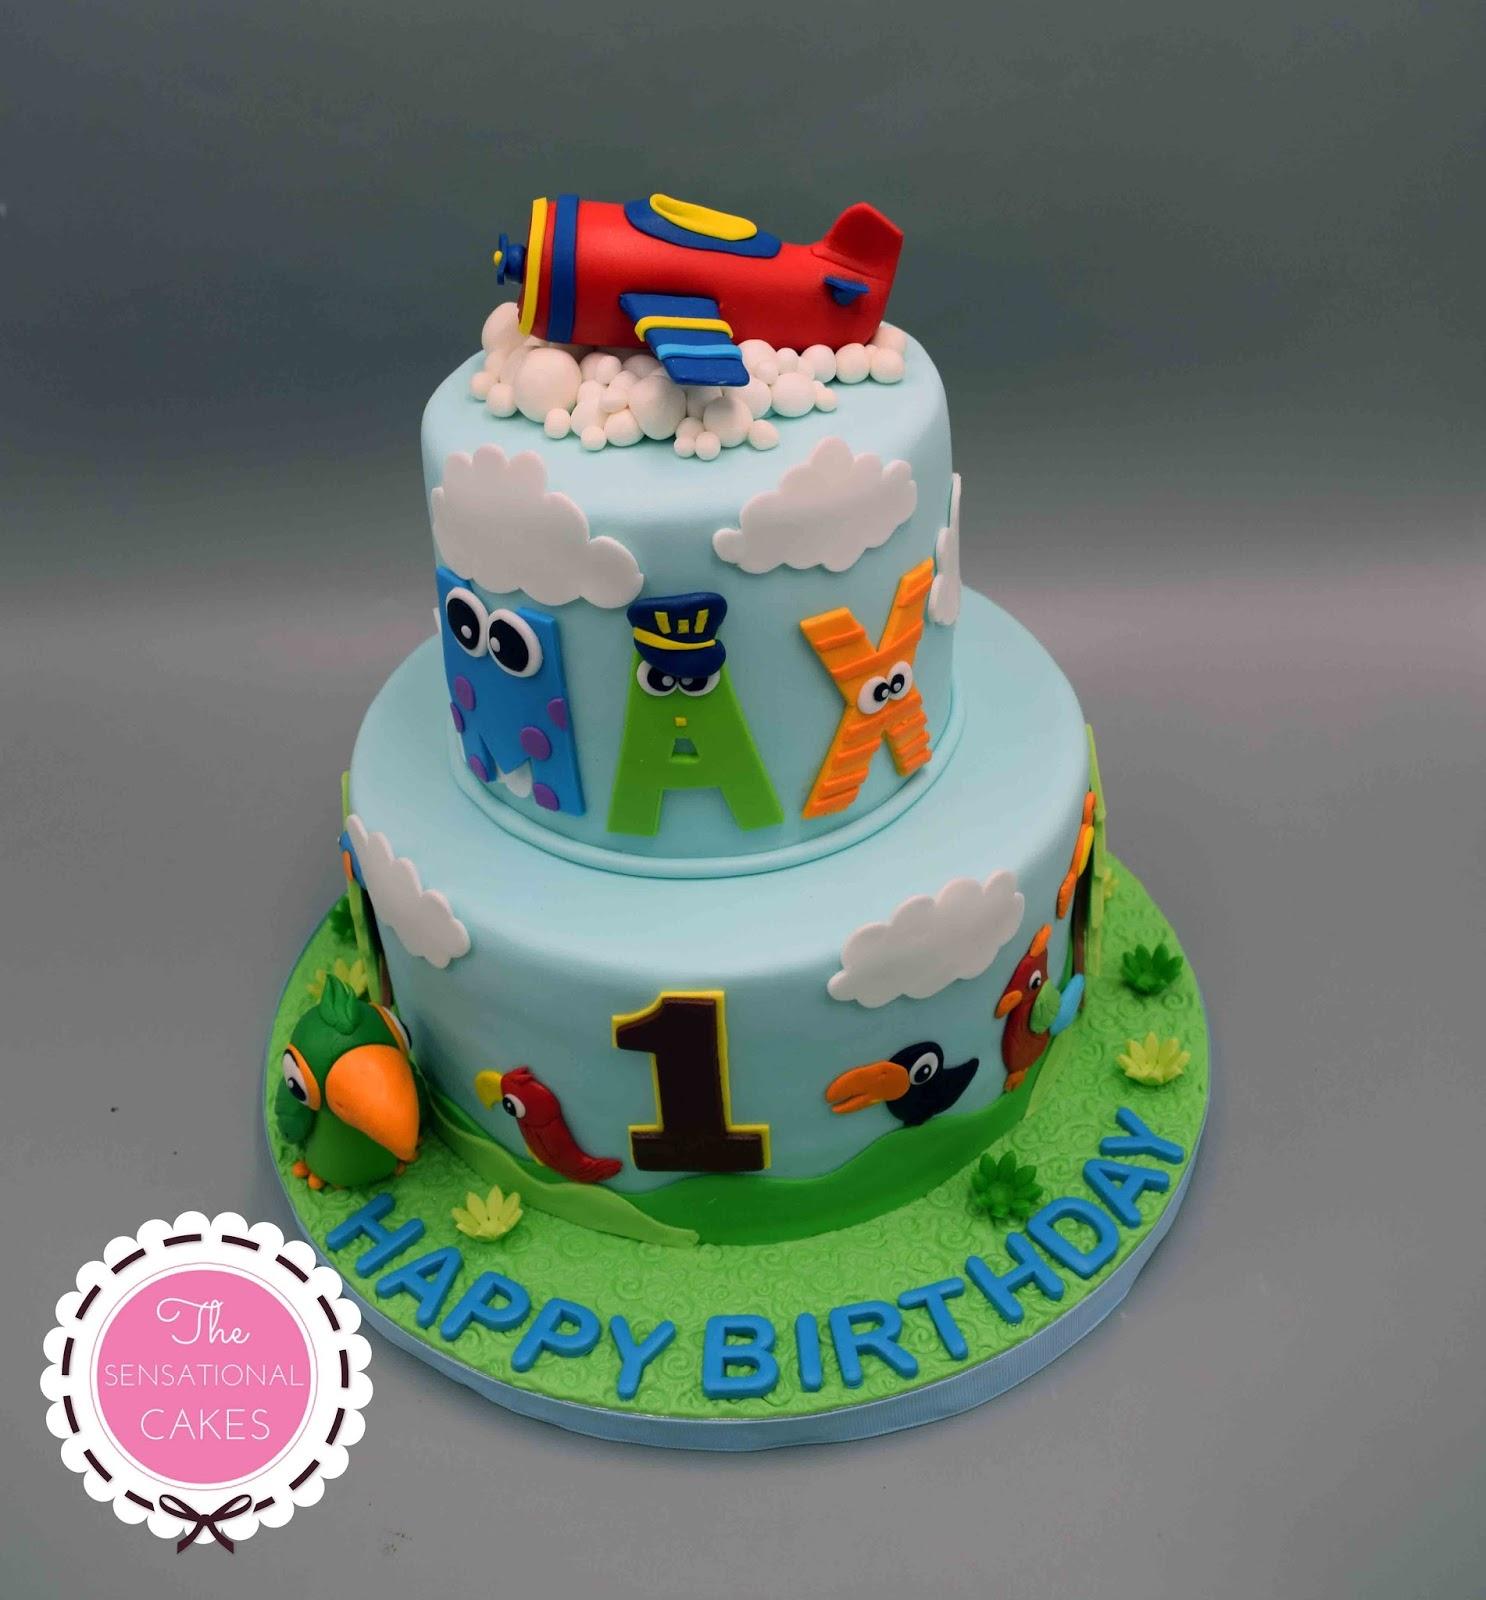 Swell The Sensational Cakes Airplane Theme Baby 1St Birthday 3D Cake Funny Birthday Cards Online Alyptdamsfinfo